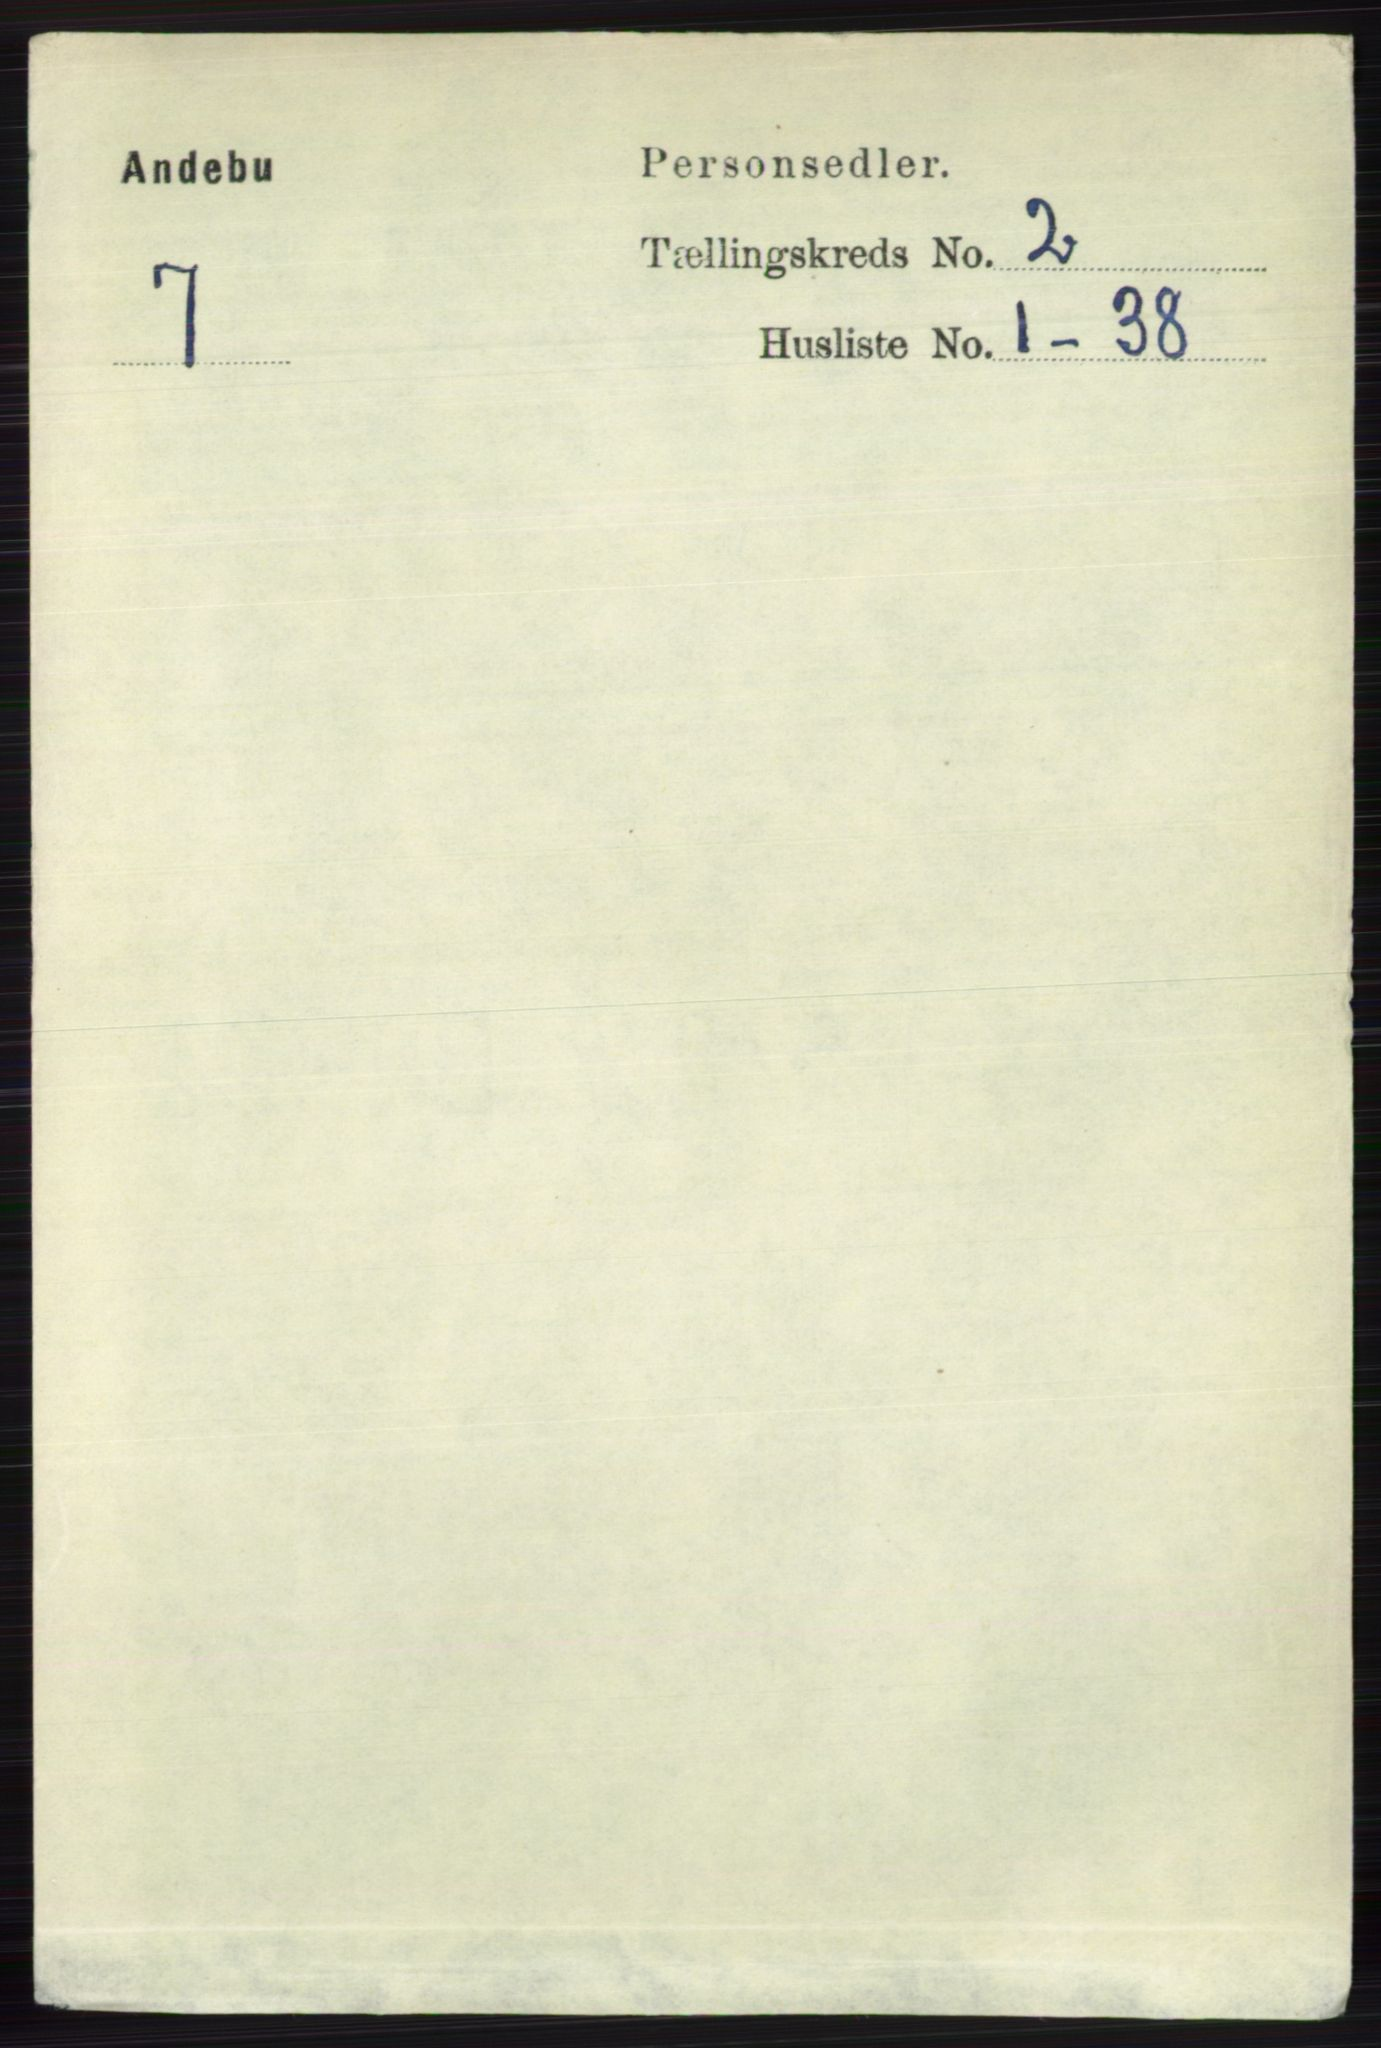 RA, Folketelling 1891 for 0719 Andebu herred, 1891, s. 899